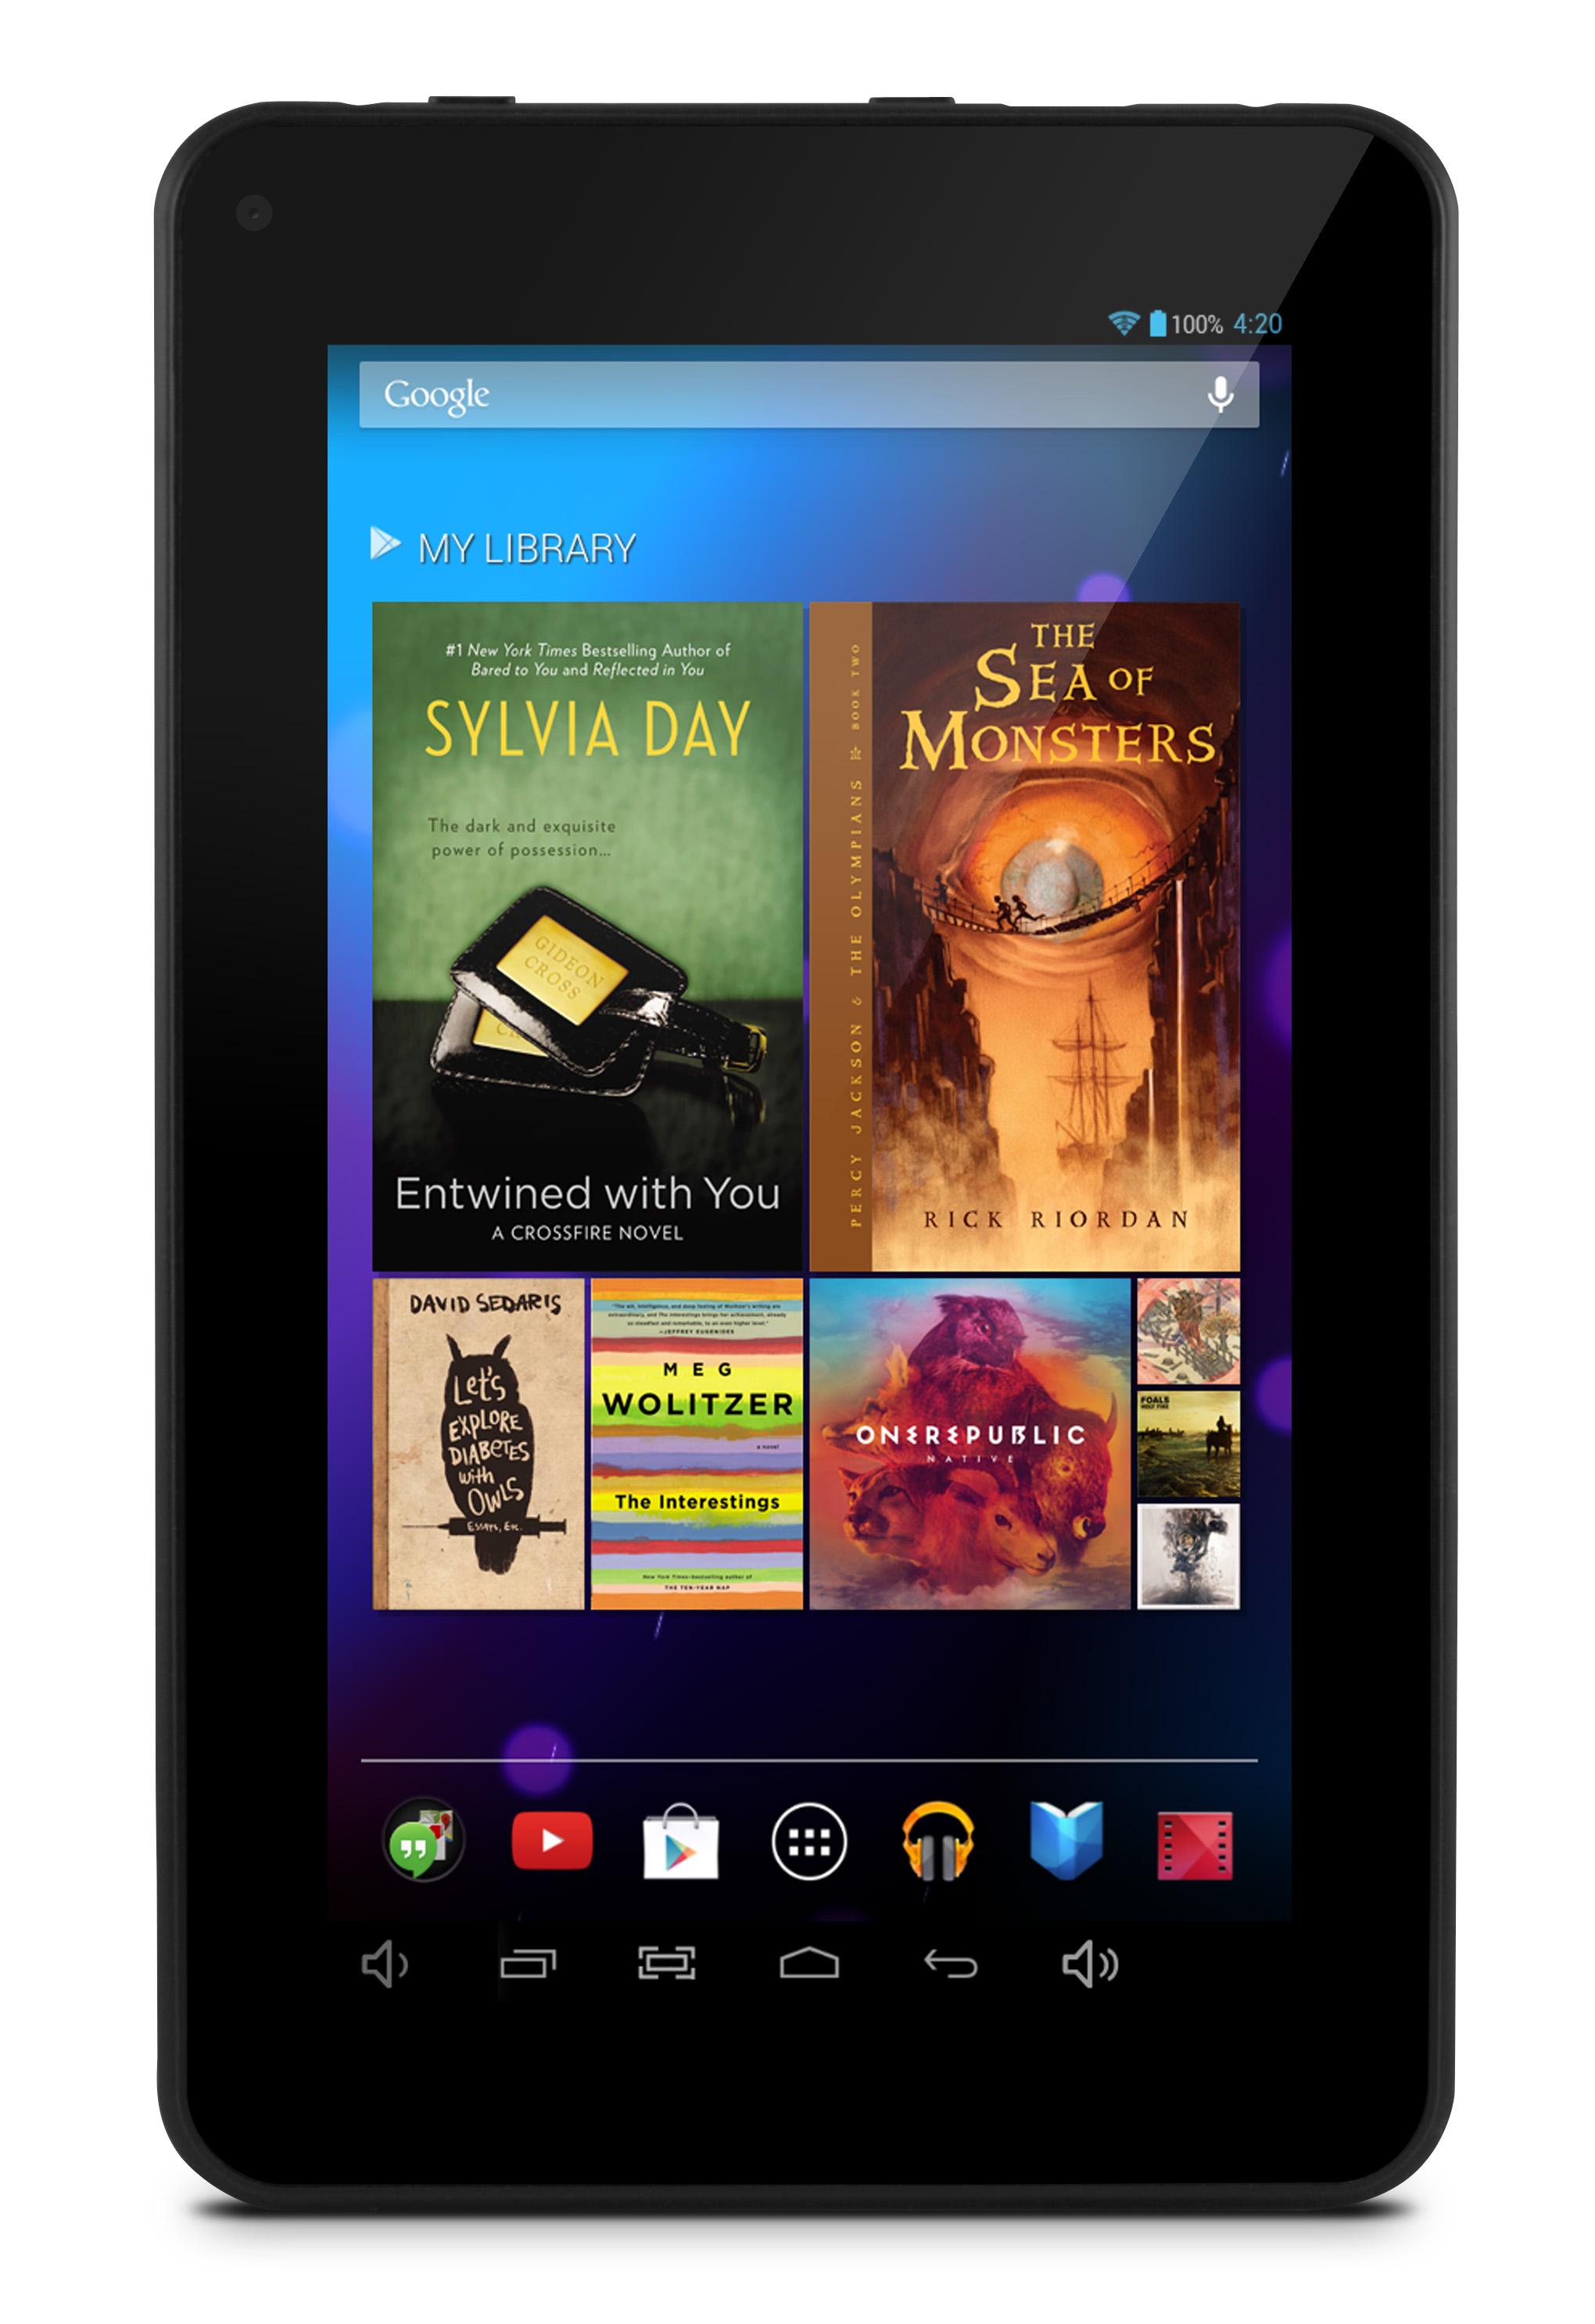 ematic 7 google android 4 2 quad core capacitive 8gb wifi. Black Bedroom Furniture Sets. Home Design Ideas